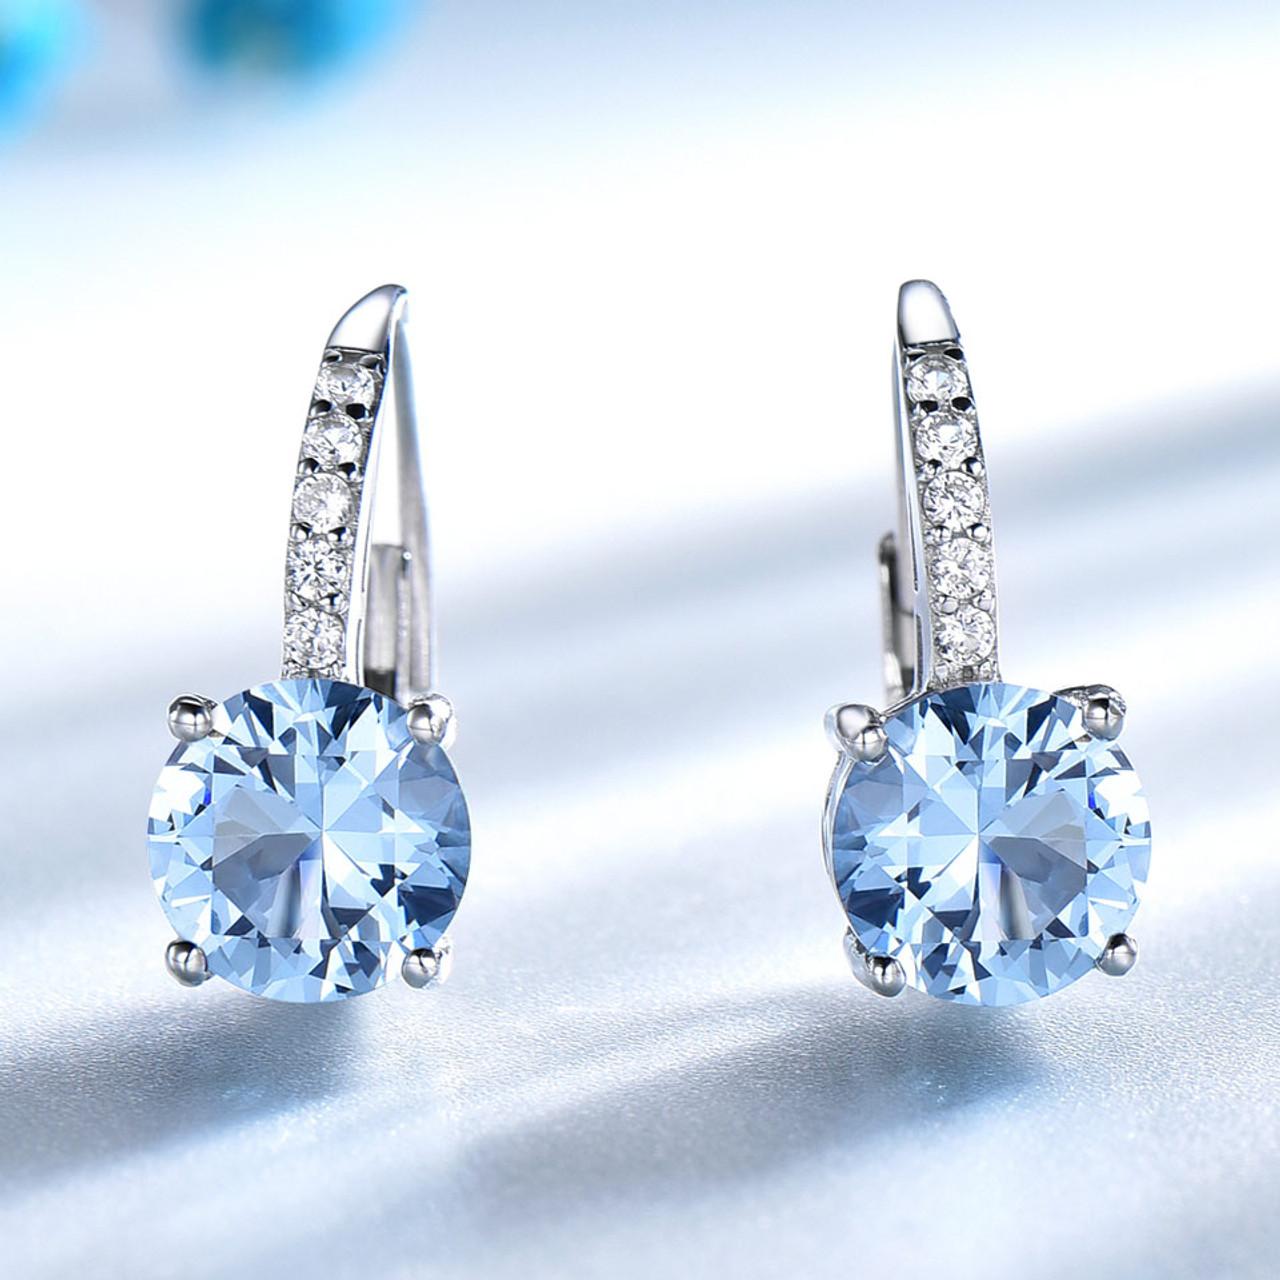 c9866cdf3 ... UMCHO Real 925 Sterling Silver Clip Earrings For Women Gemstone Sky  Blue Topaz Female Earrings Round ...